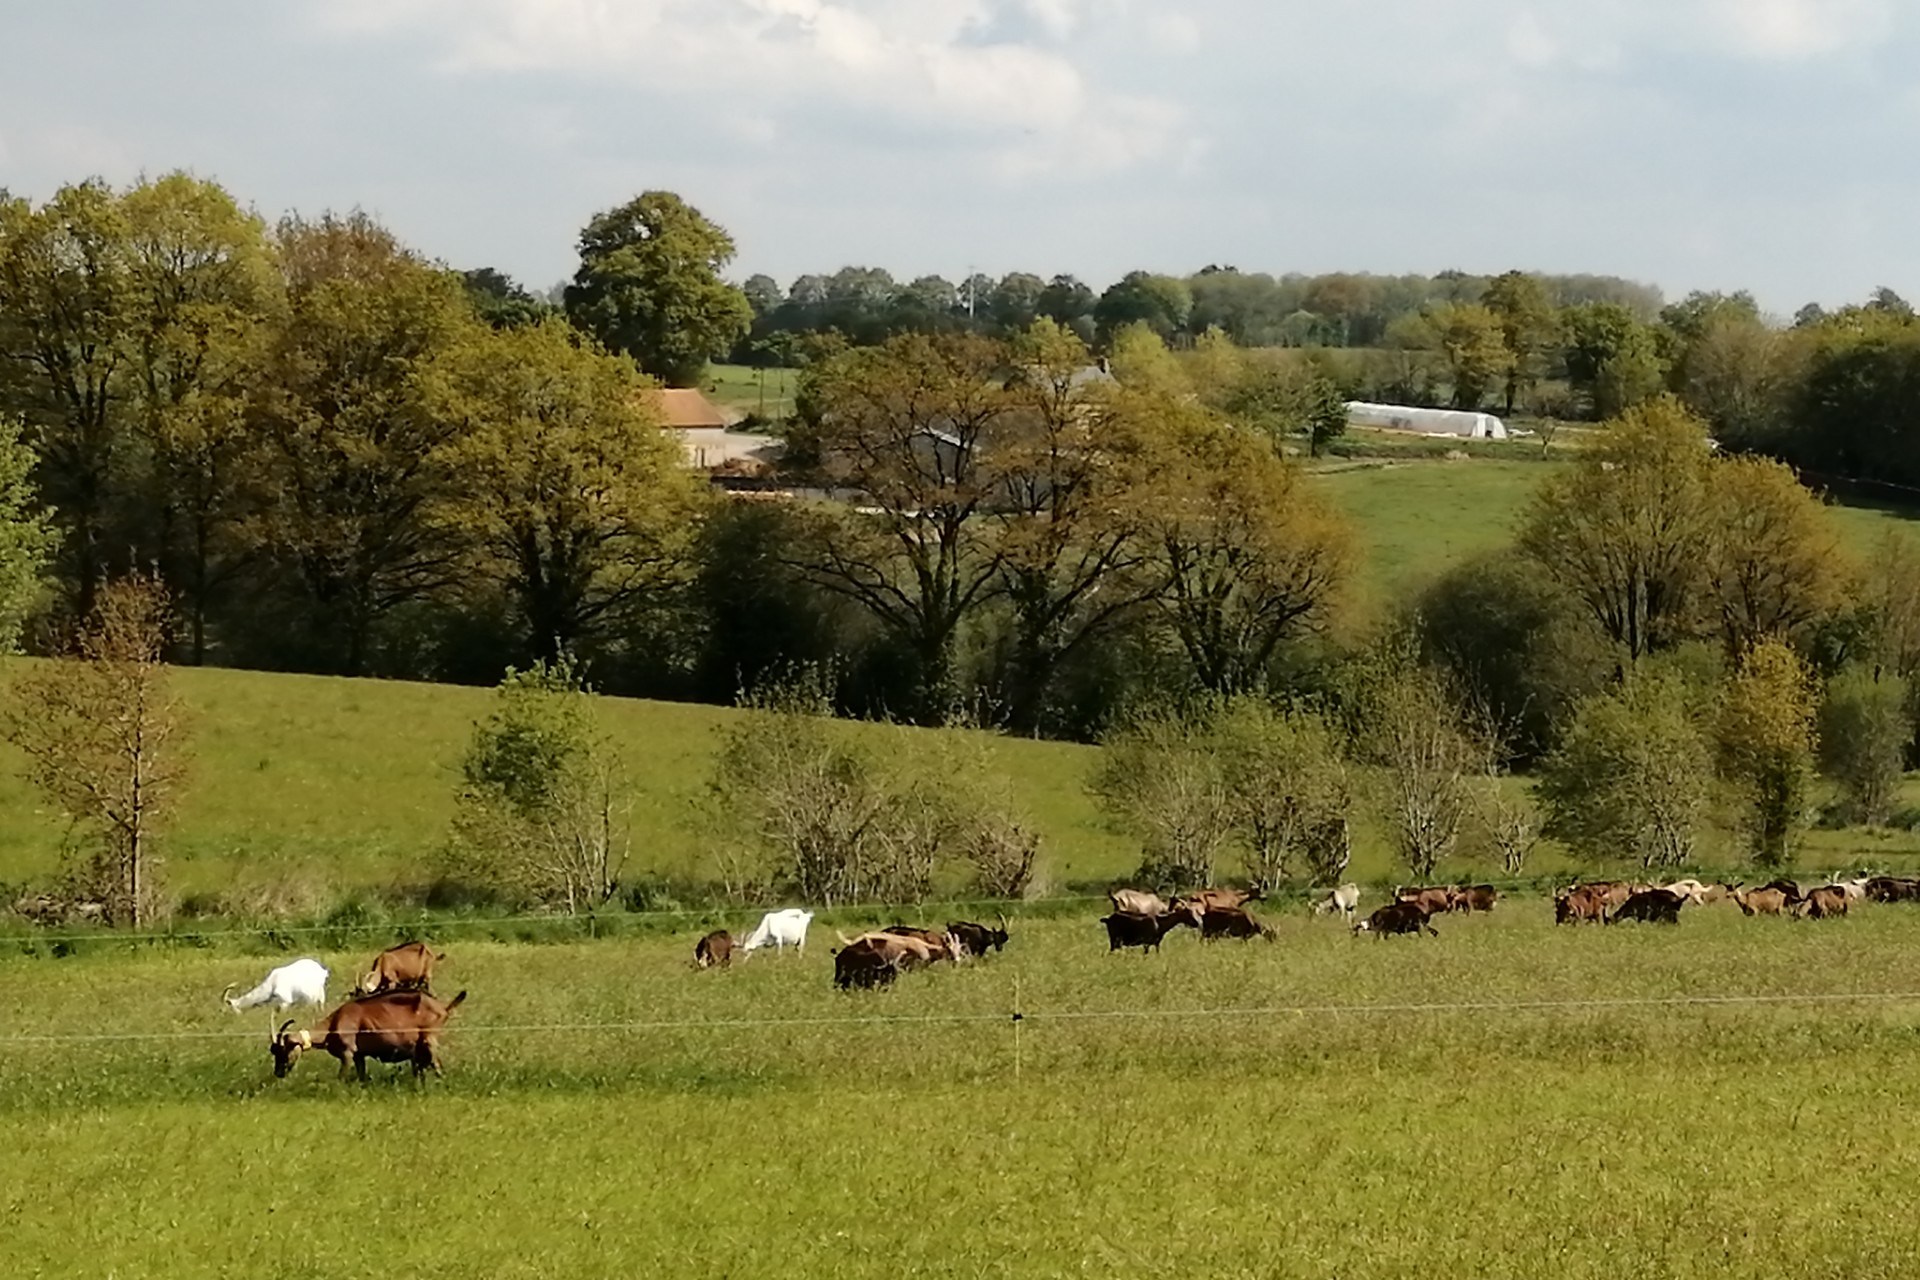 Chèvres qui paturent